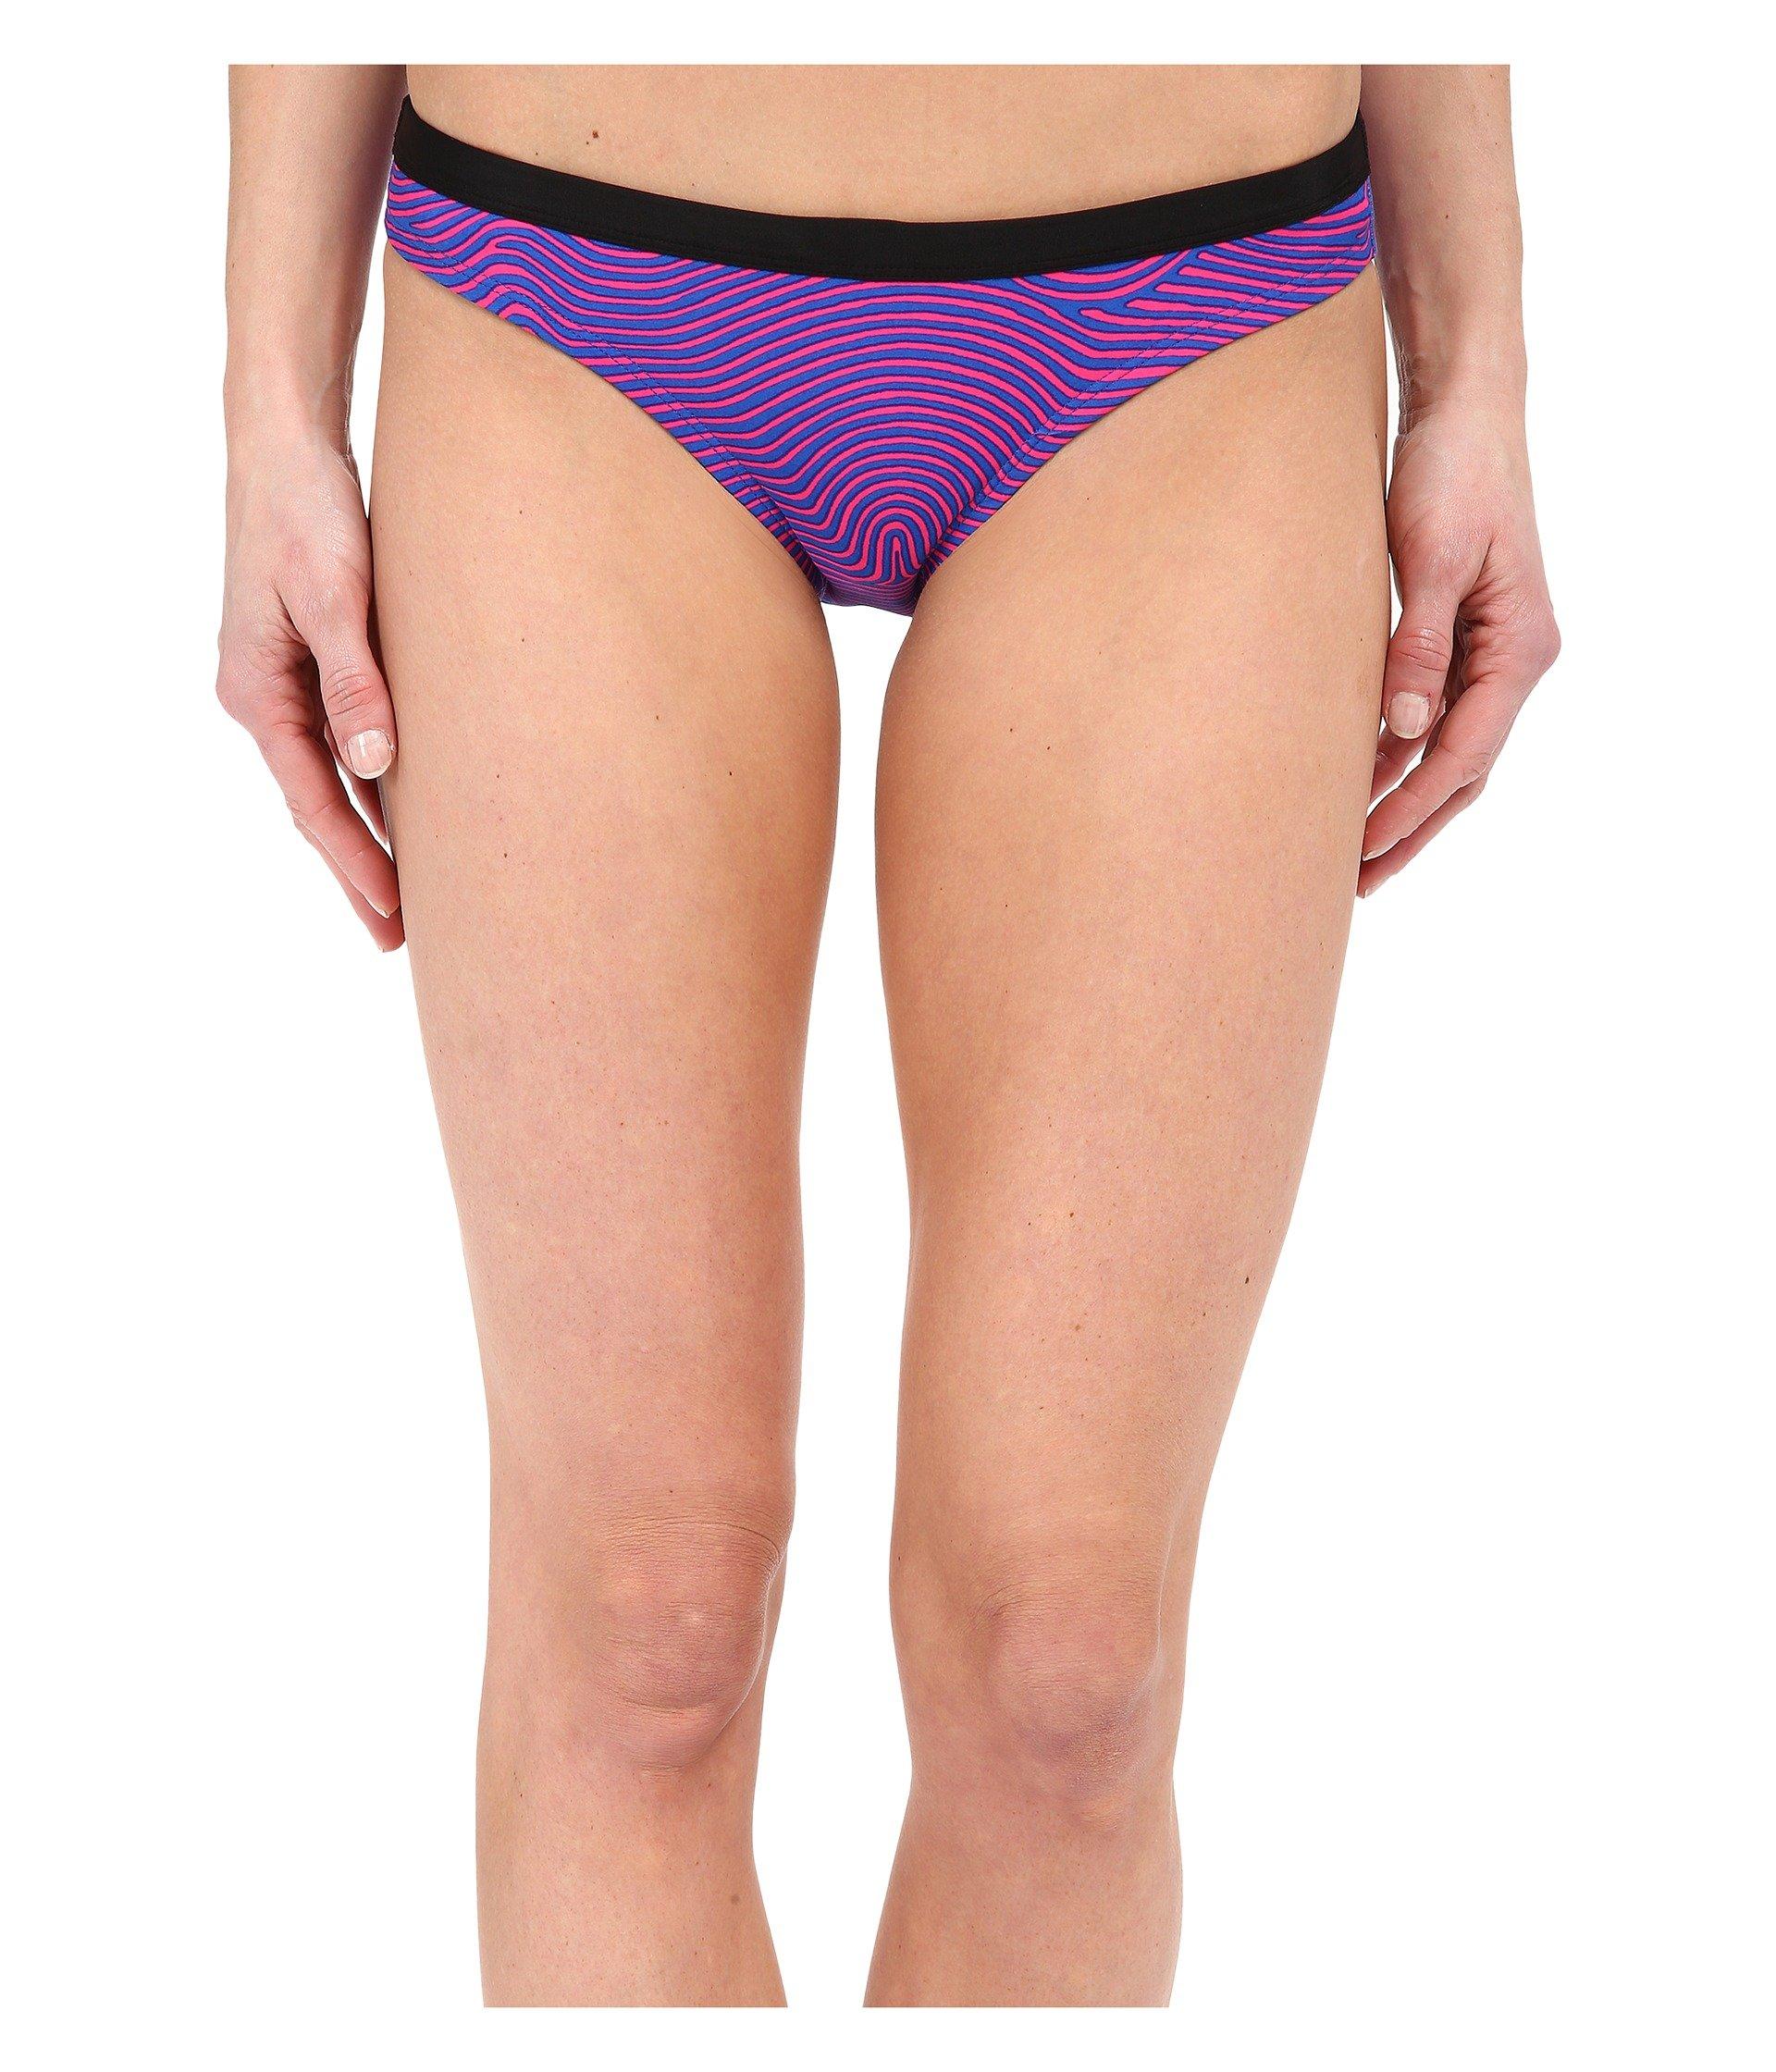 Bikini para Mujer Nike Briefs  + Nike en VeoyCompro.net